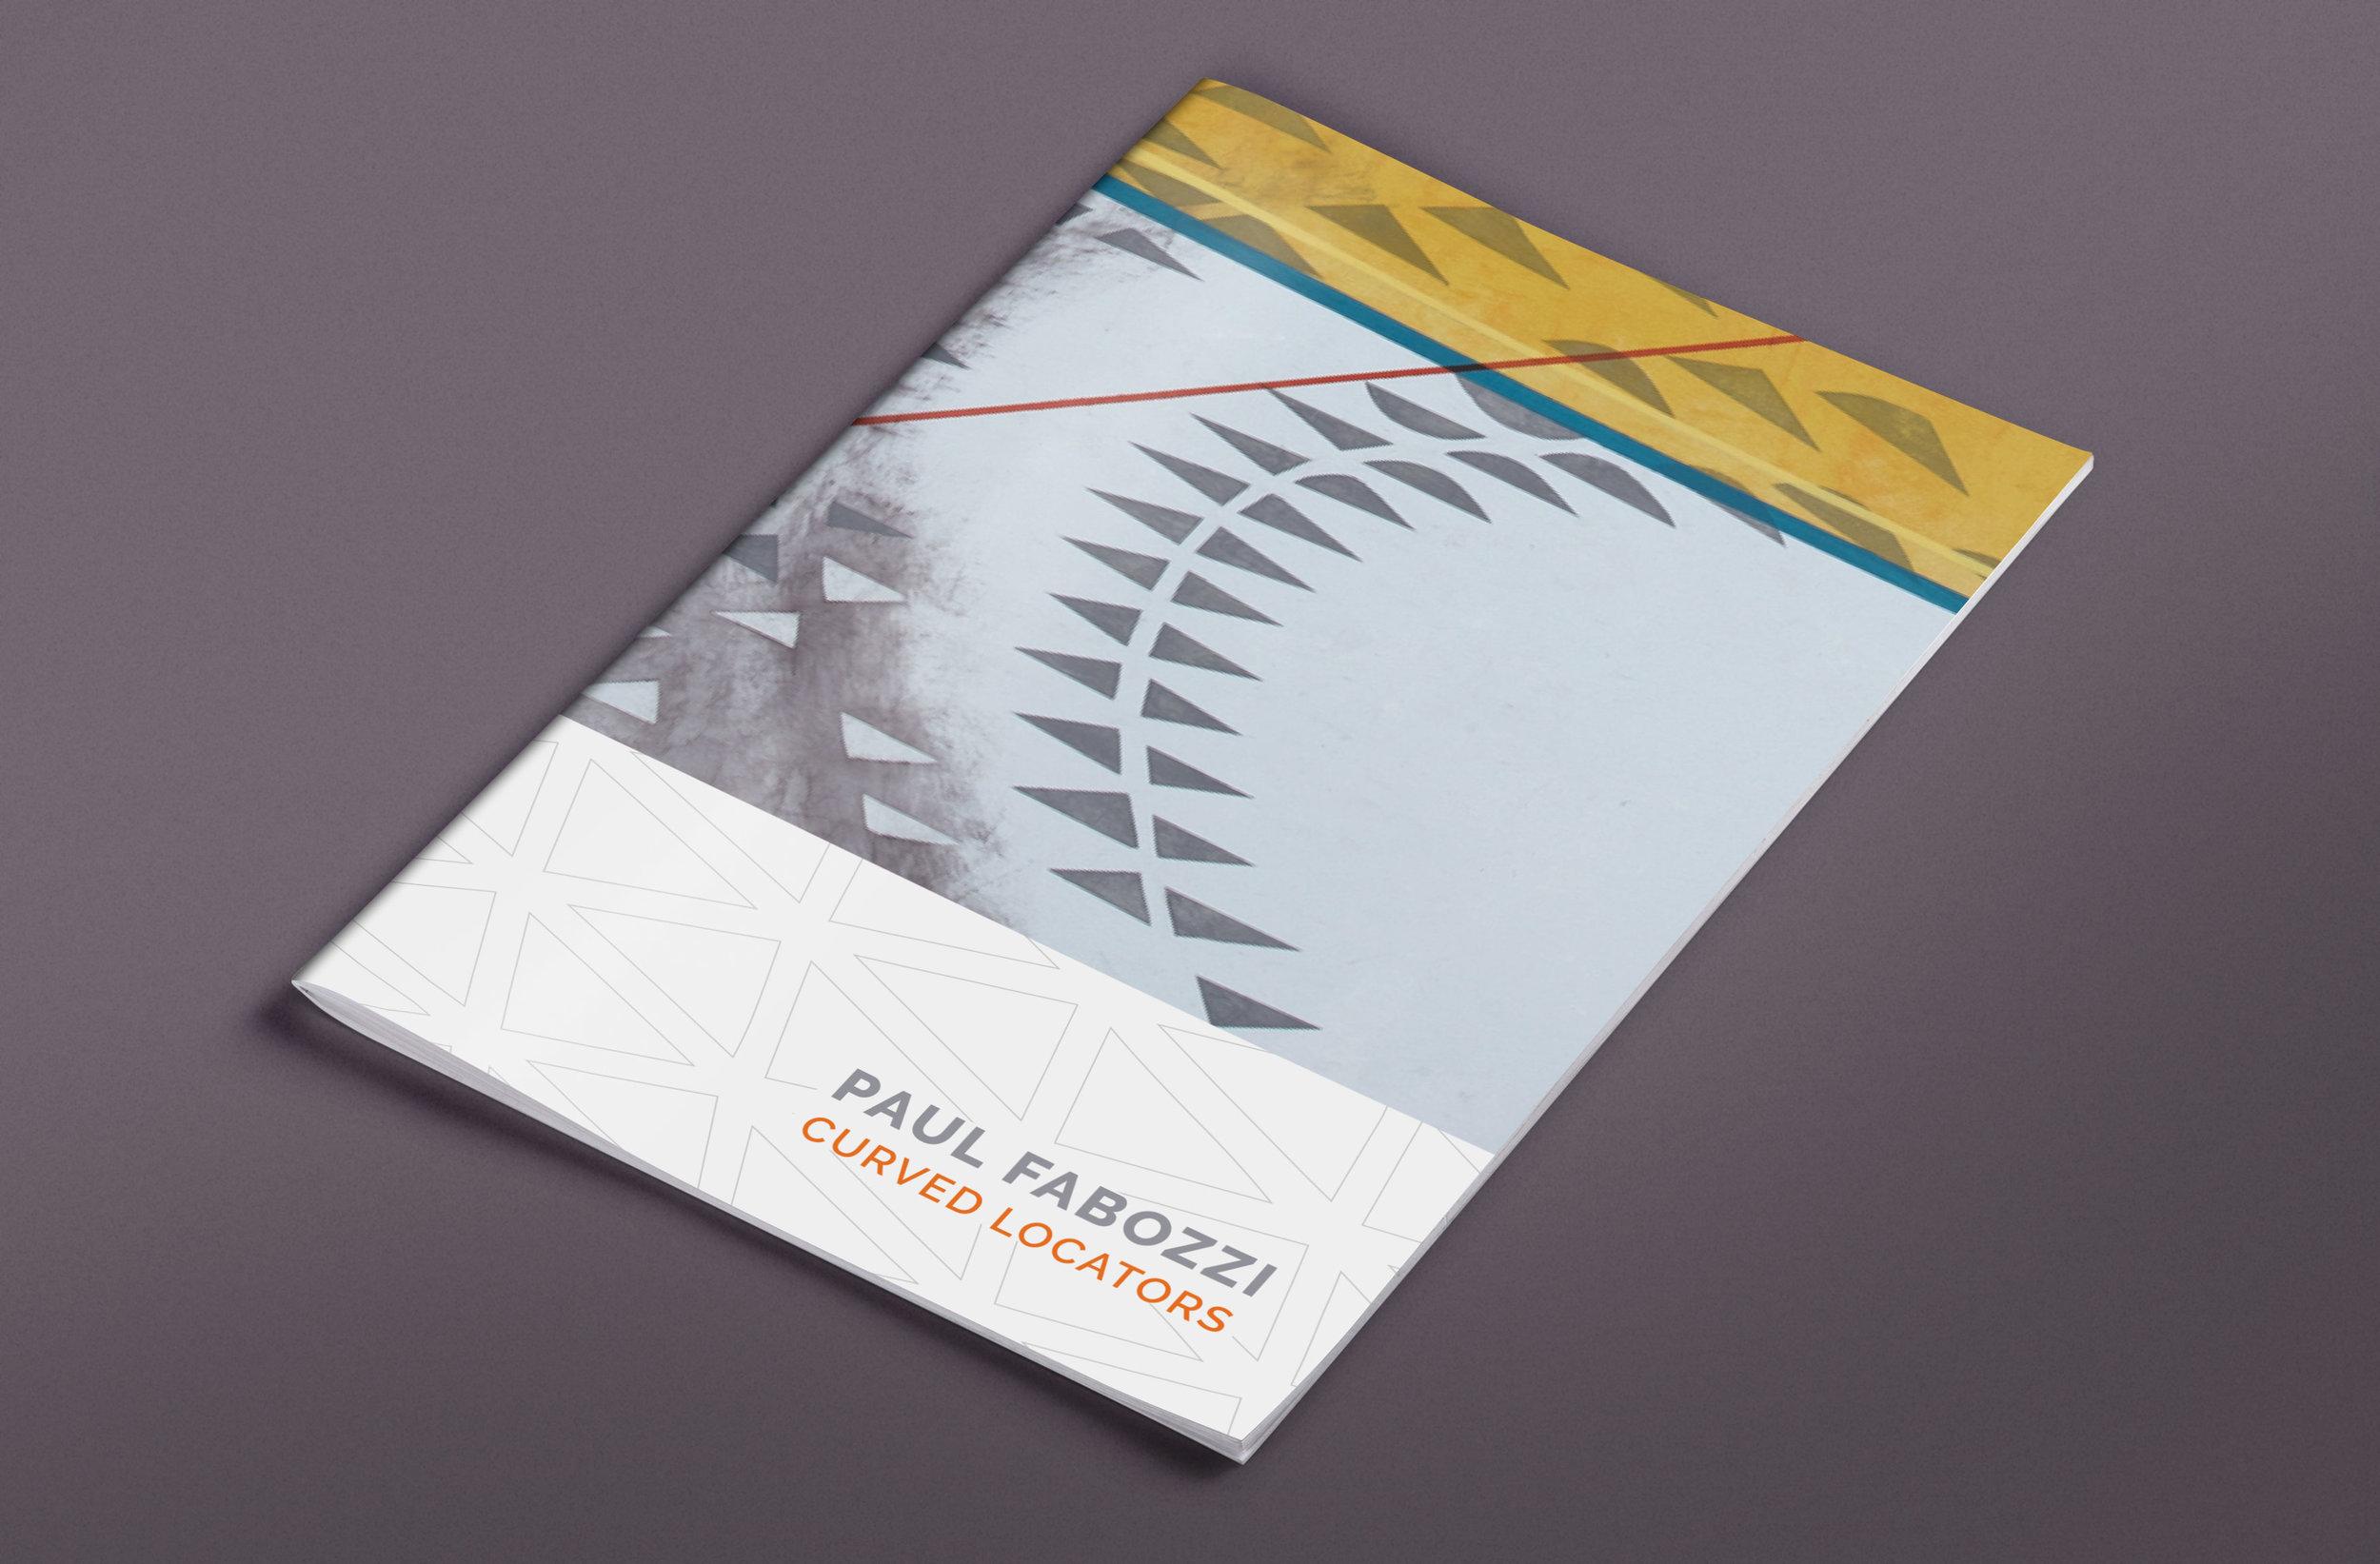 CURVED LOCATORS — PAUL FABOZZI  PRINT DESIGN